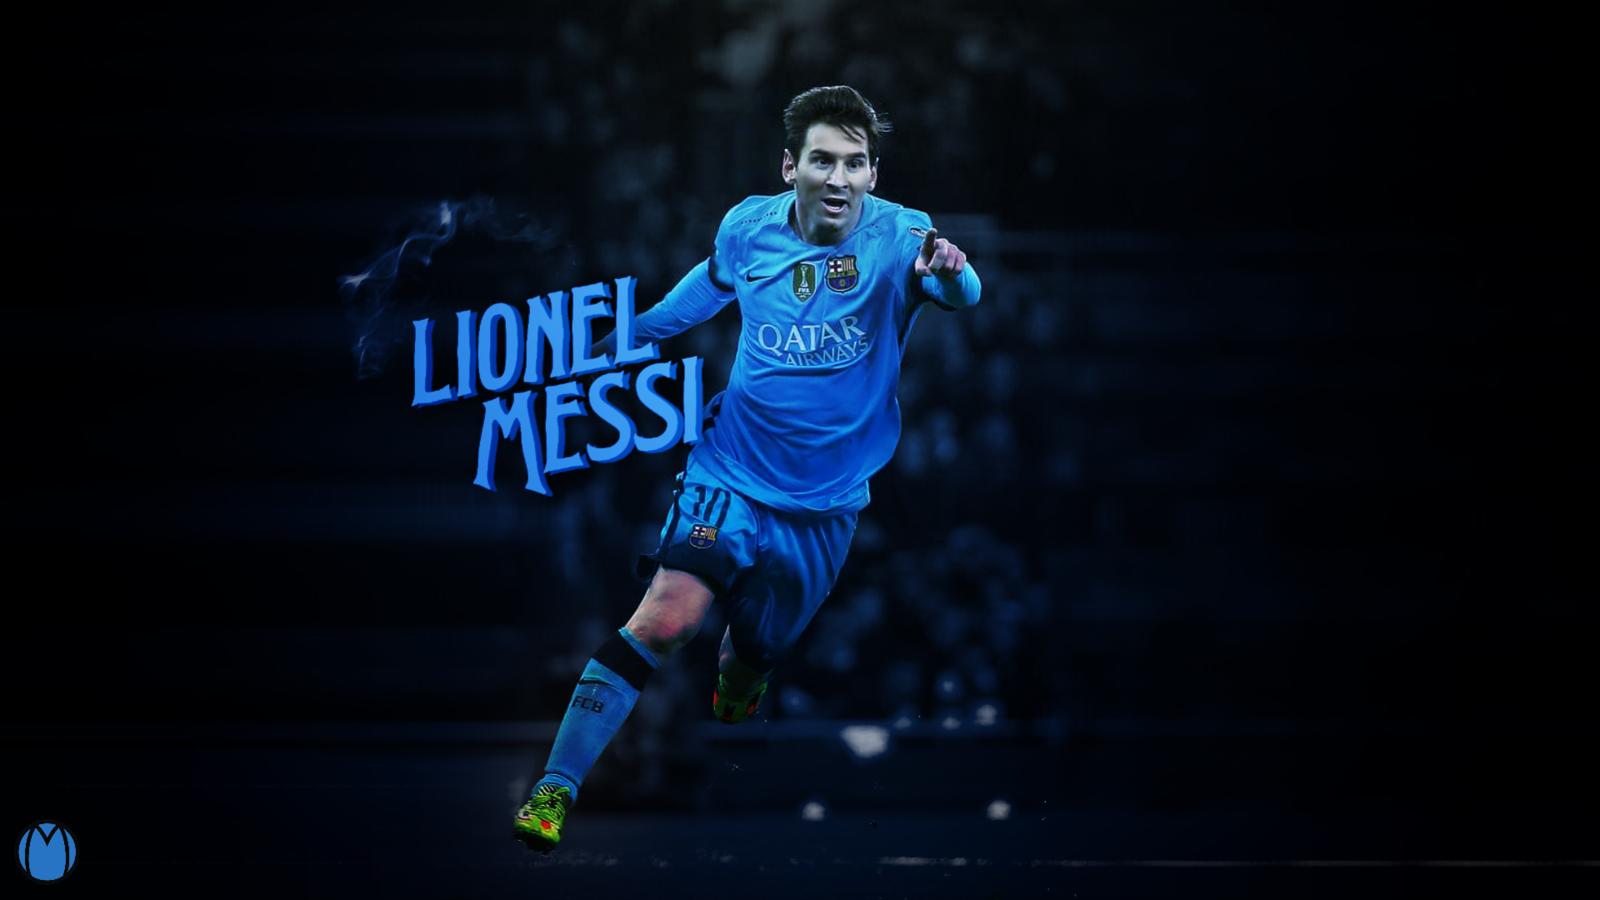 Lionel Messi 2016 Wallpaper   Design by MhmdAo 1600x900